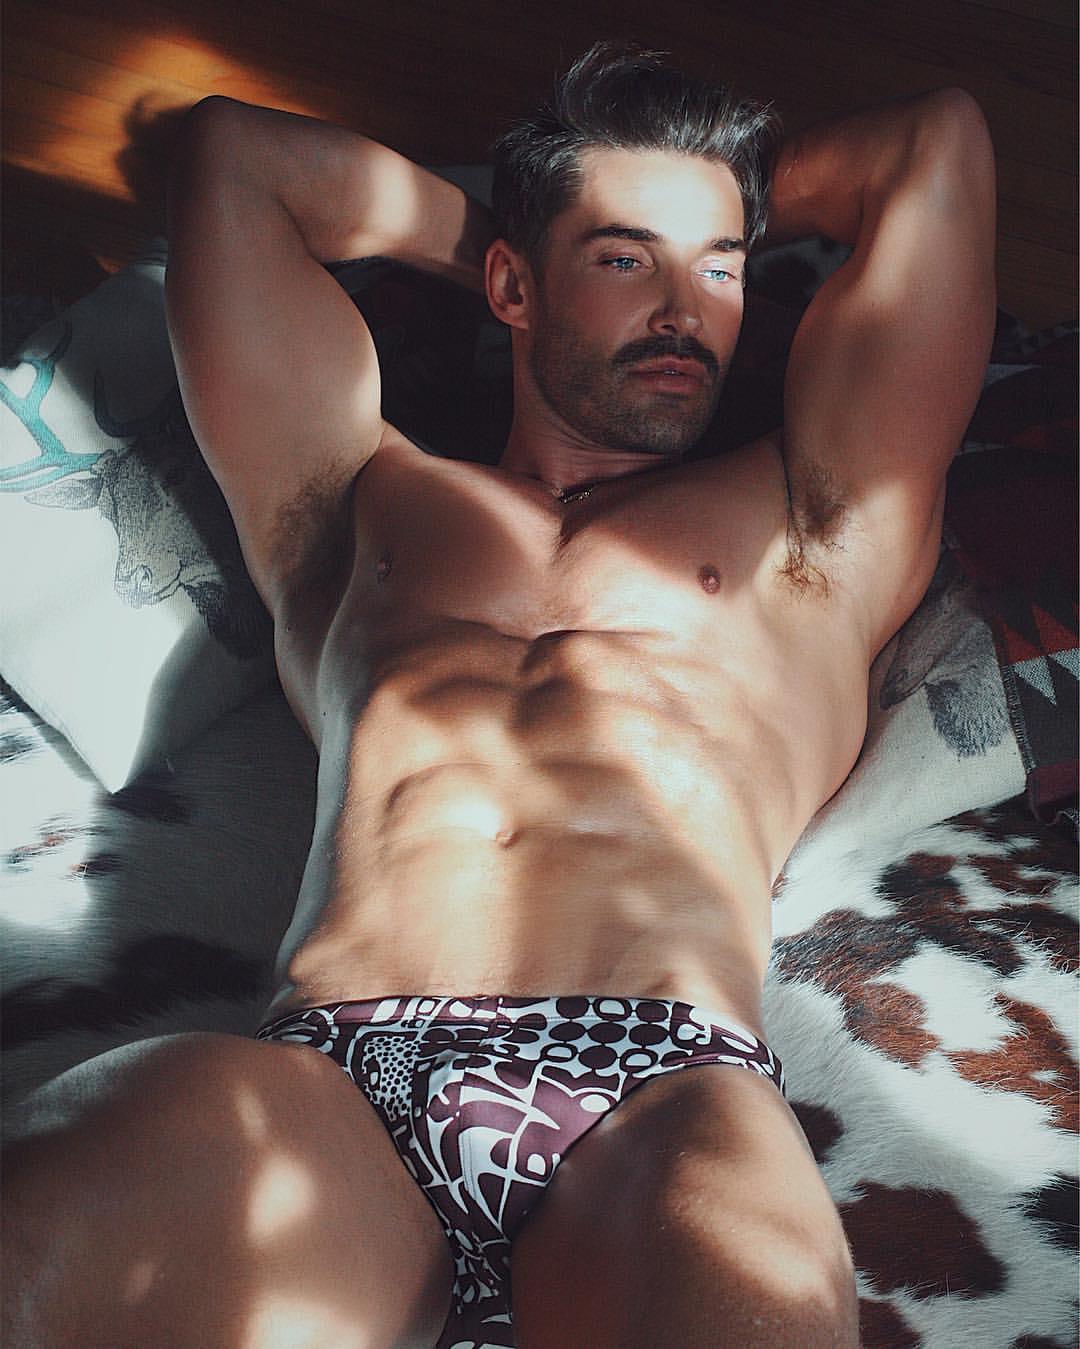 Gay hounslow